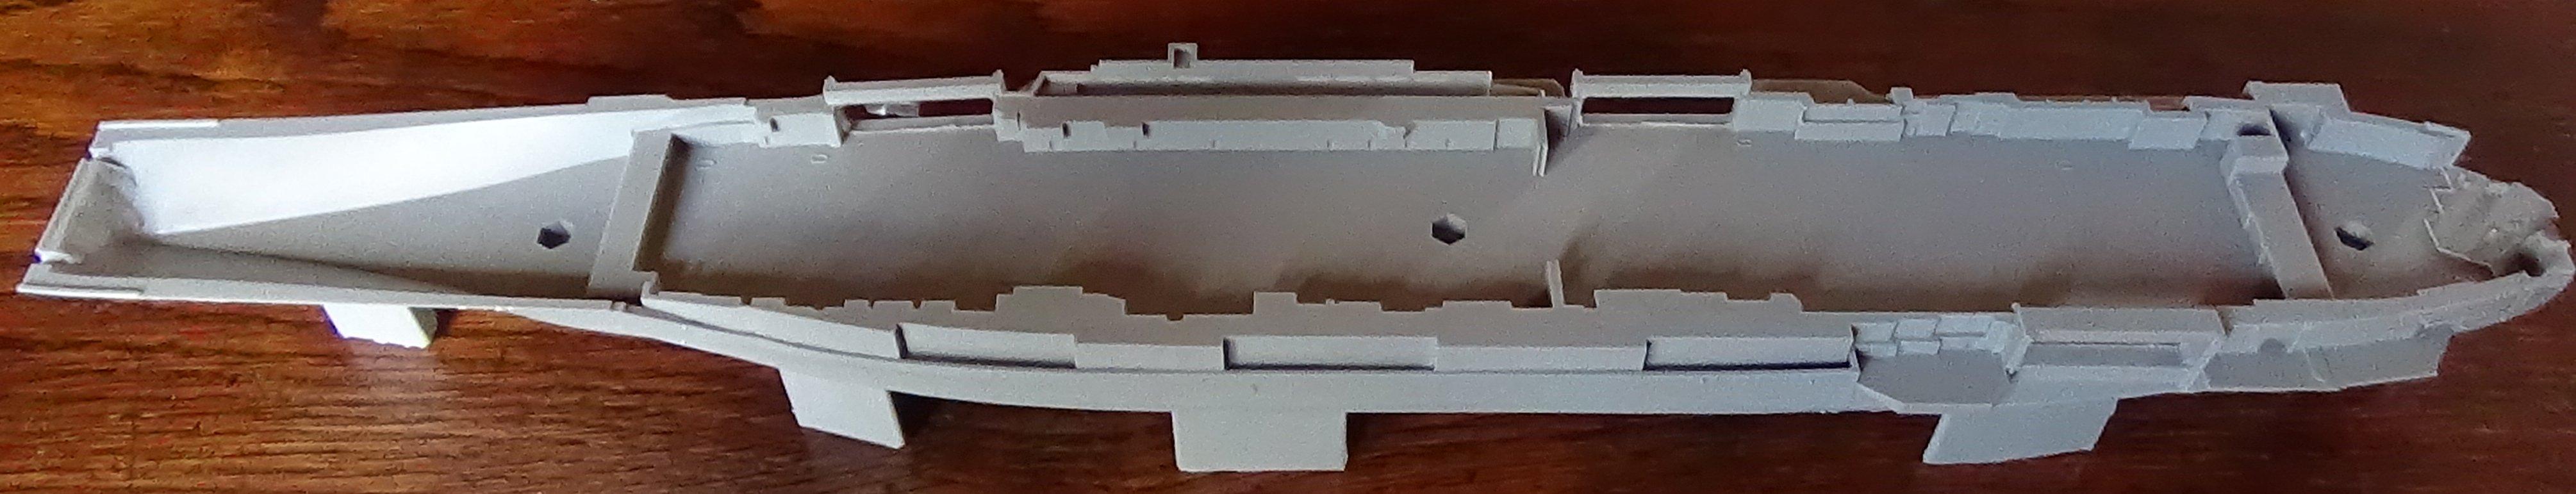 [USS Midway CVA-41] Porte avions lourd américain-700e-Orange Hobby 17071905040323134915155996